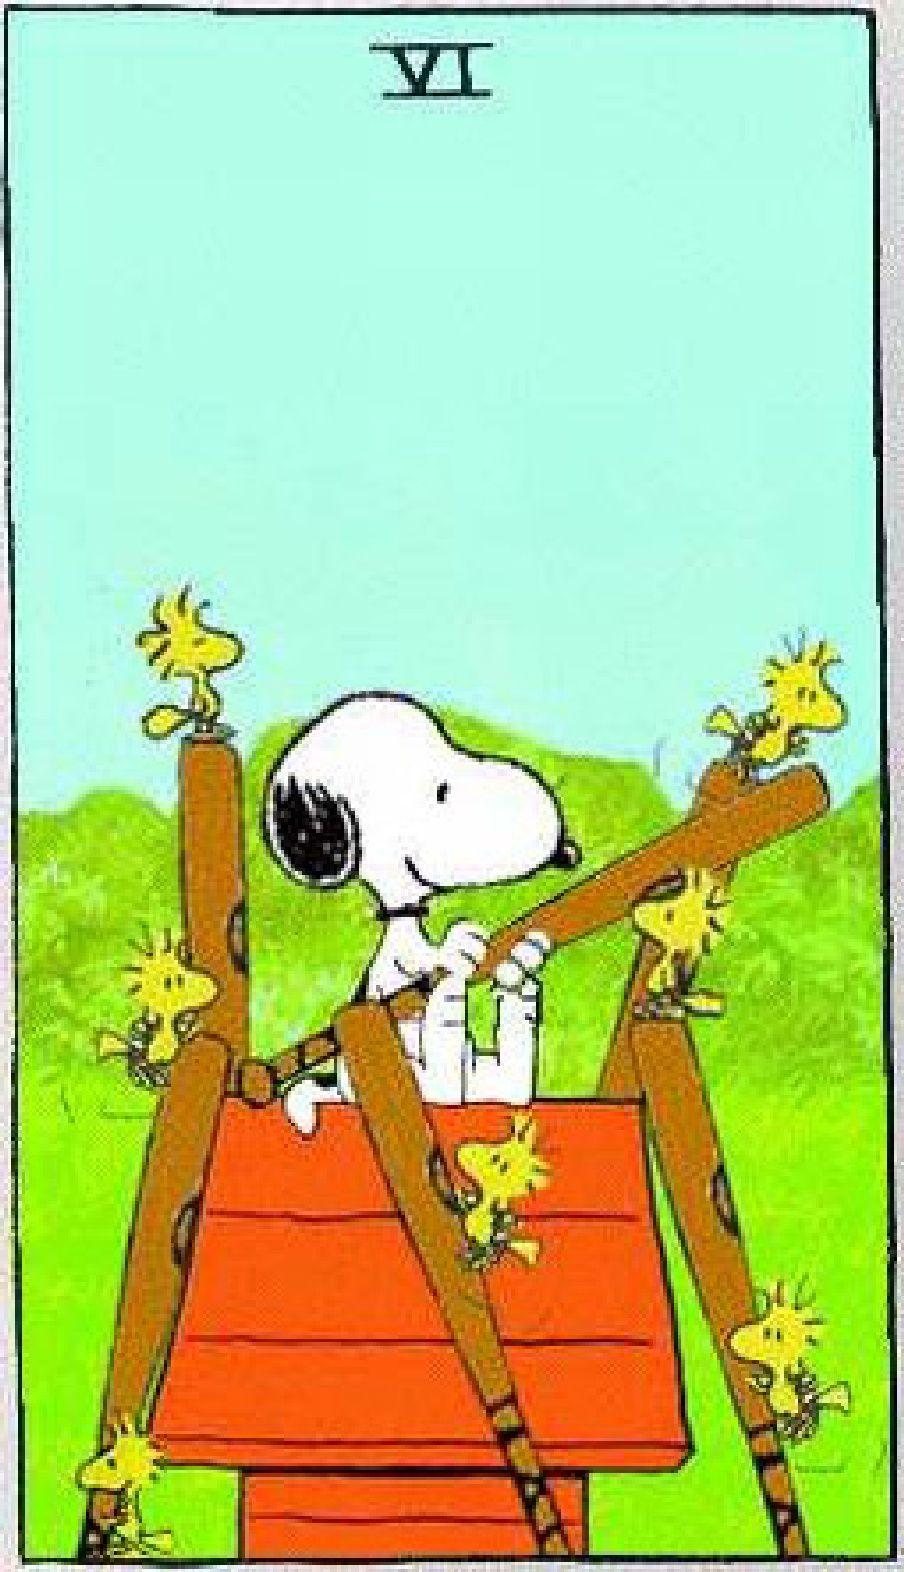 Snoopy woodstock and friends doing construction on snoopy 39 s doghouse woodstock and snoopy - Charlie brown bilder ...